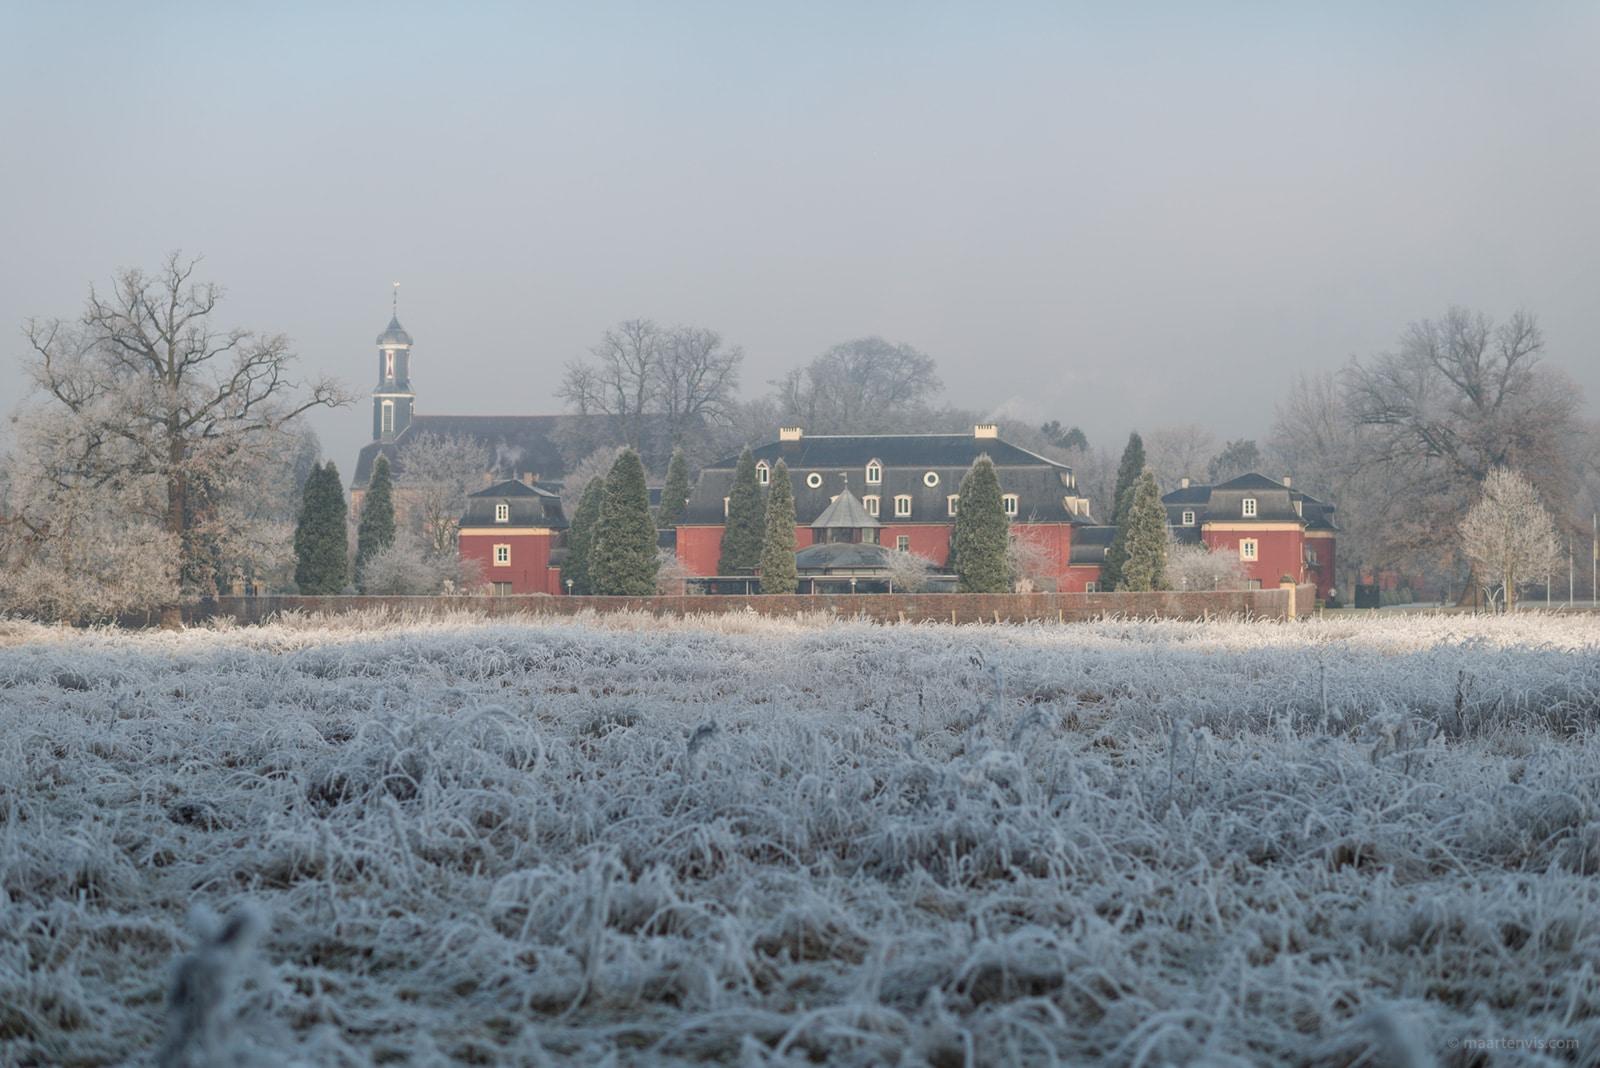 20161231 7293 - Winter in Limburg